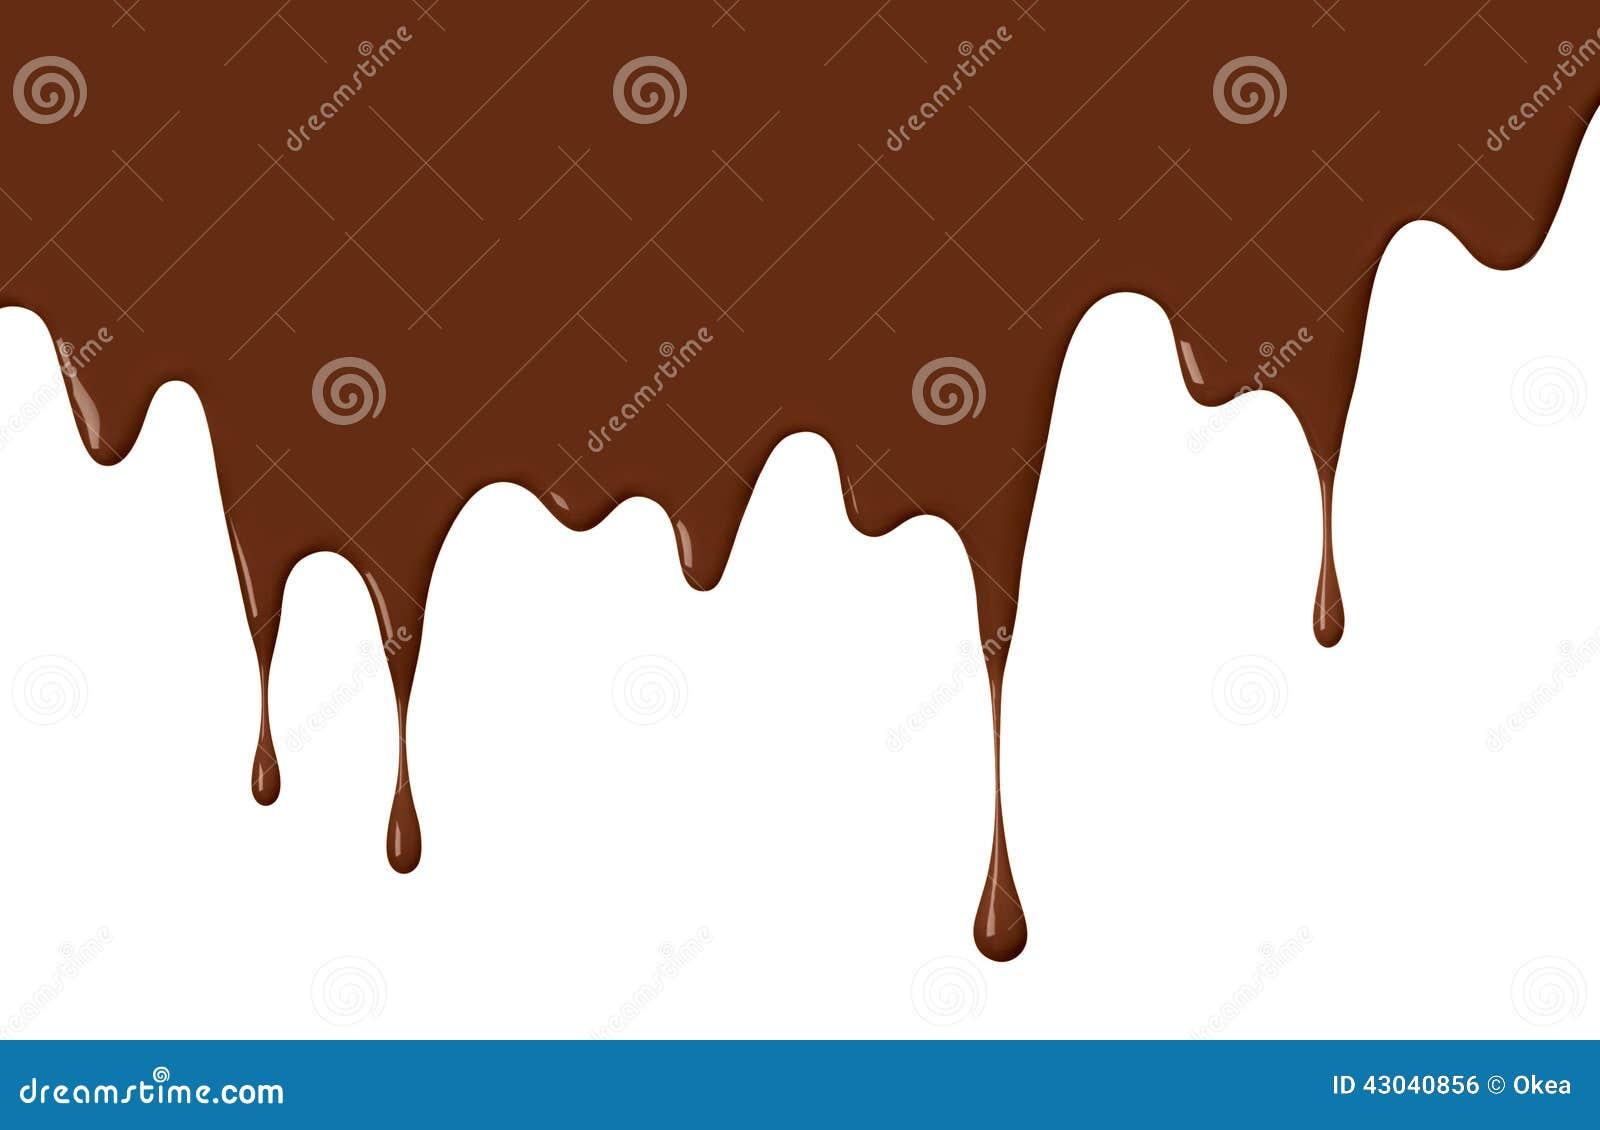 Chocolate Drips... Dripping Chocolate Background